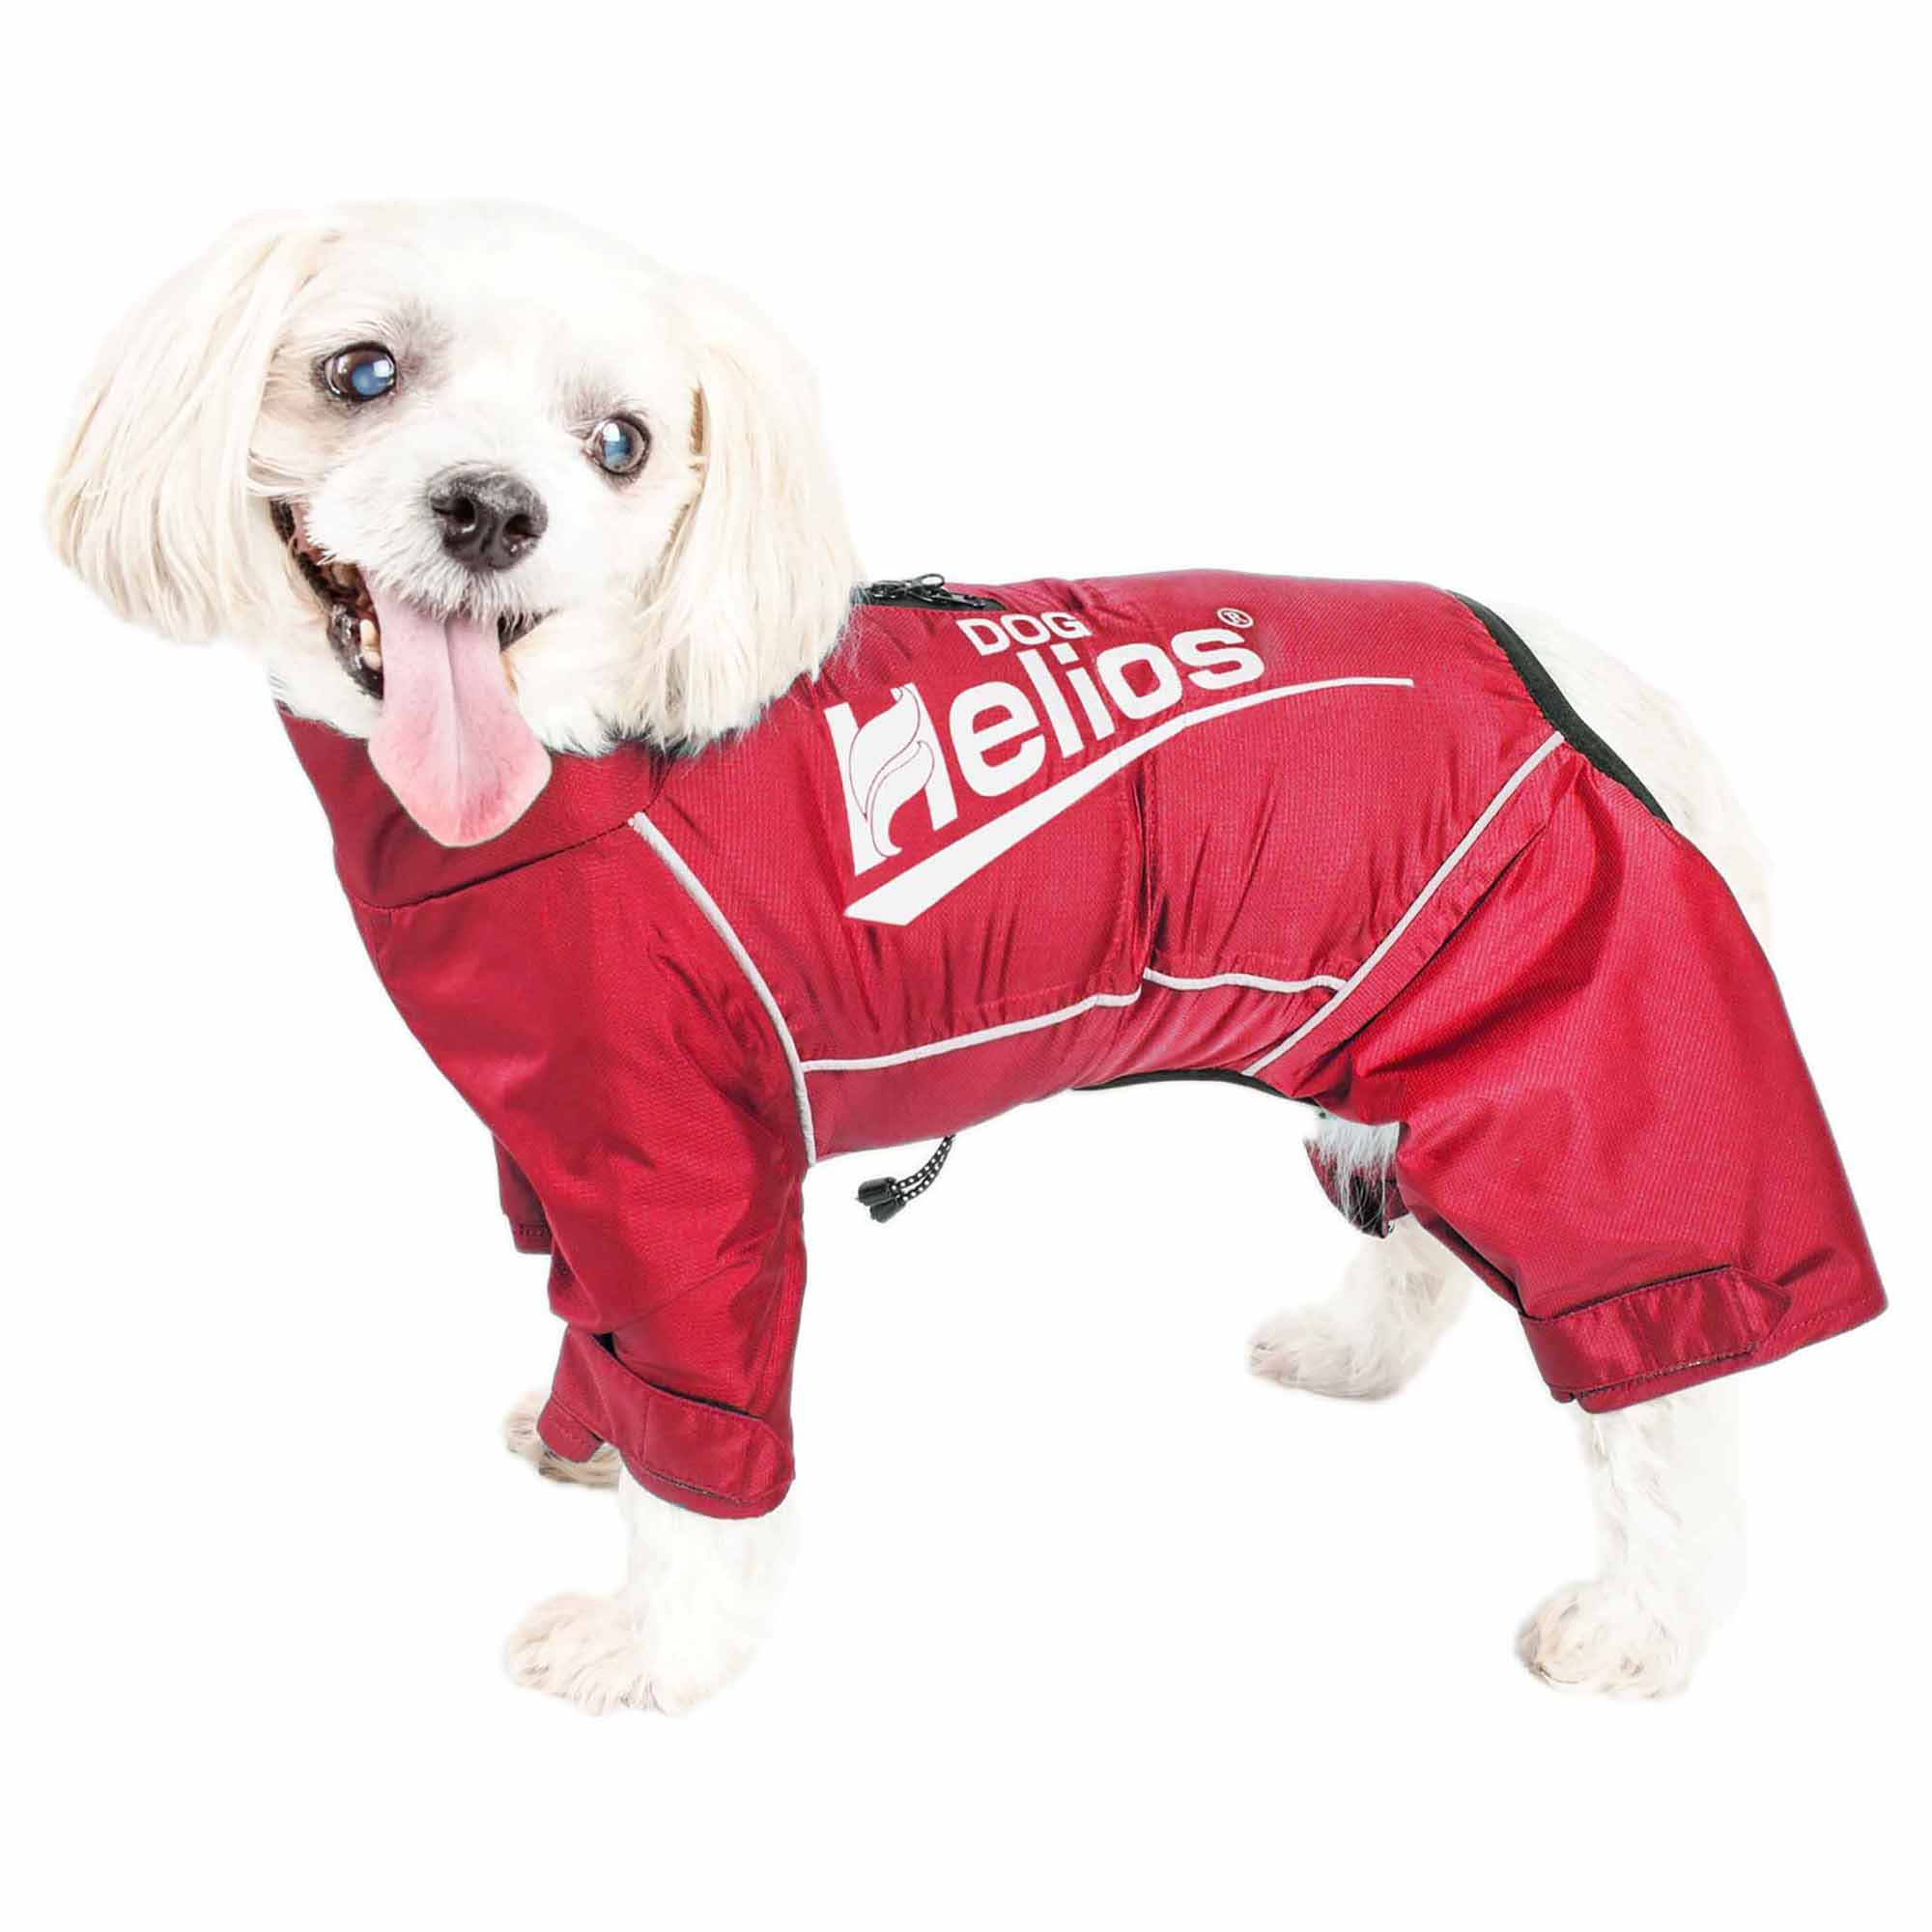 Dog Helios ® 'Hurricanine' Waterproof And Reflective Full Body Dog Coat Jacket W/ Heat Reflective TechnologyDog Helios ® 'Hurricanine' Waterproof And Reflective Full Body Dog Coat Jacket W/ Heat Ref